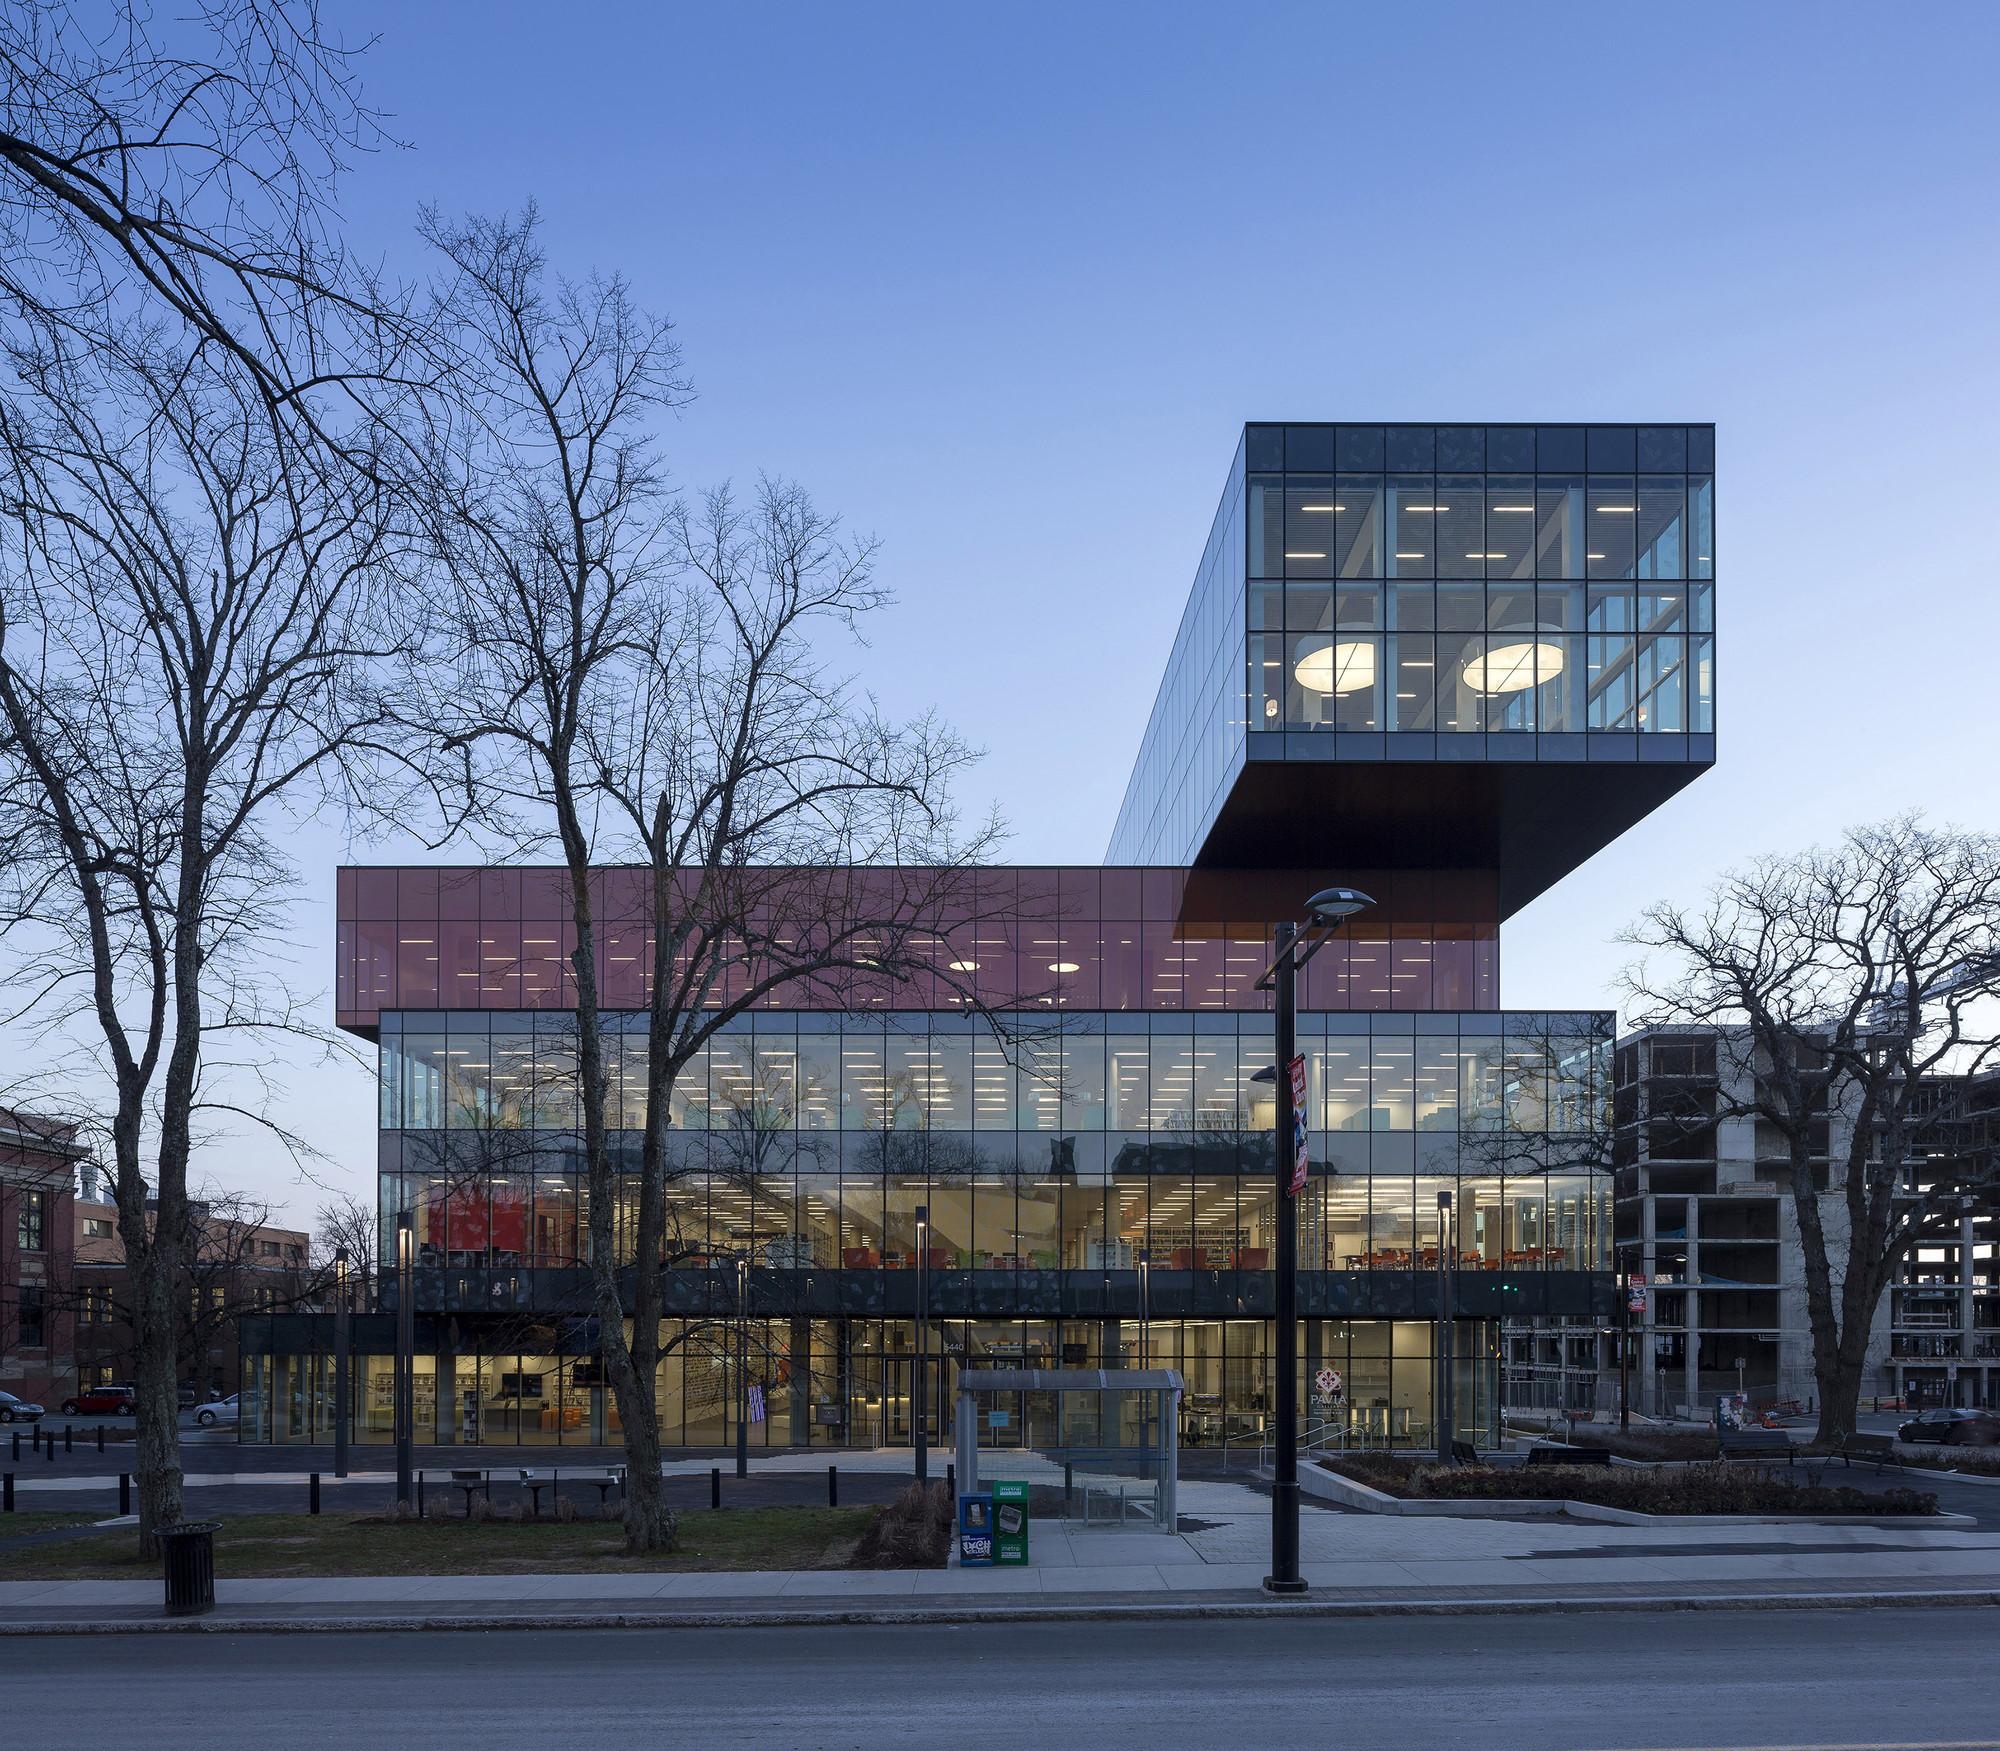 New Halifax Central Library / Schmidt Hammer Lassen + Fowler Bauld & Mitchell, © Adam Mørk